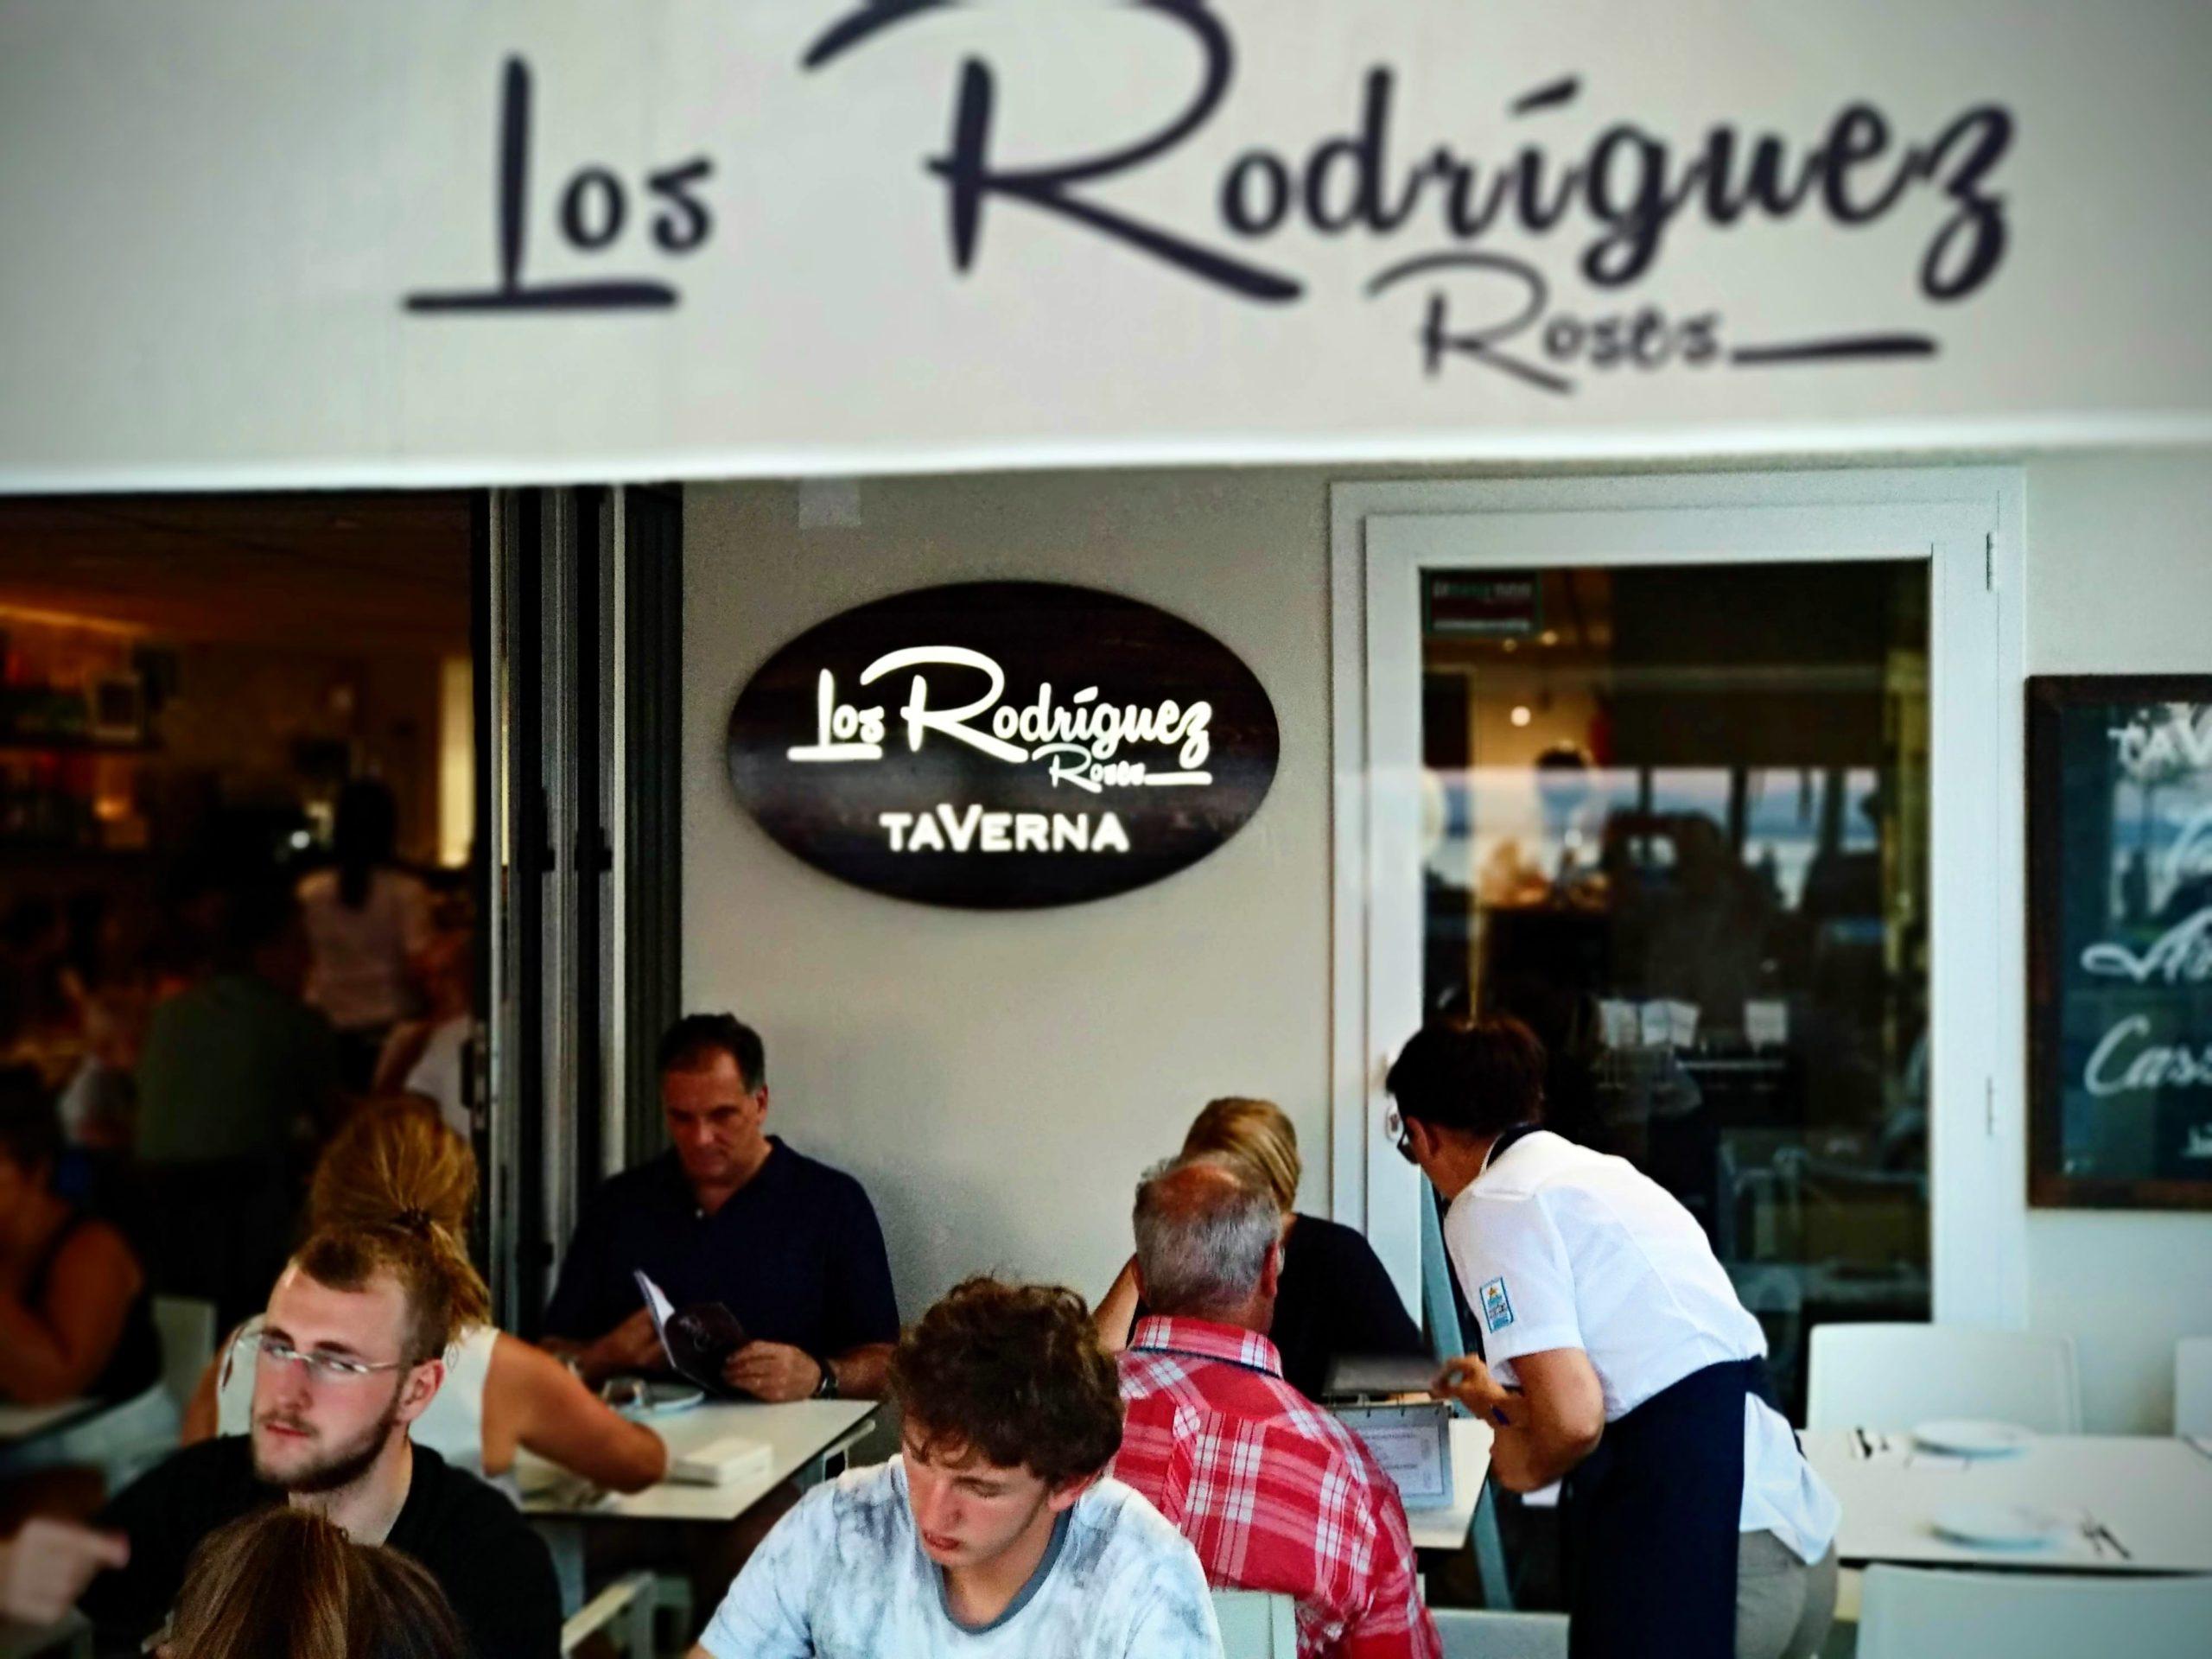 Restaurant Los Rodriguez